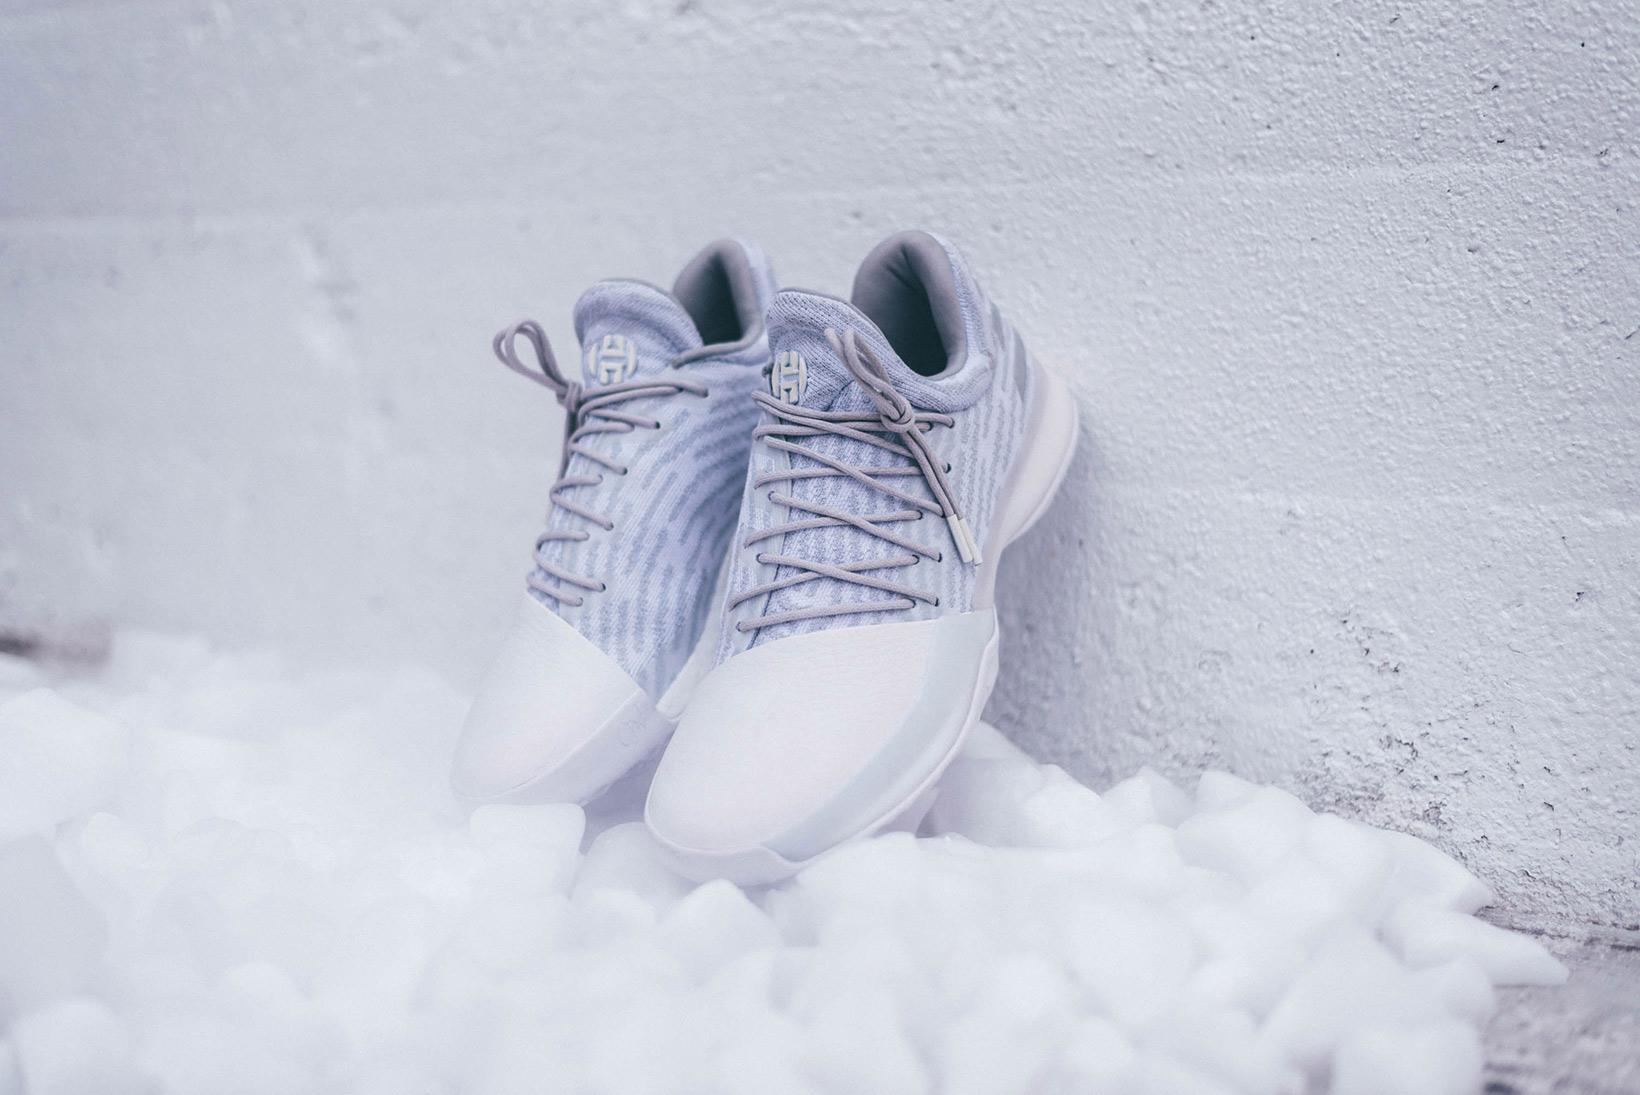 Adidas Harden Vol 1 13 Below Zero